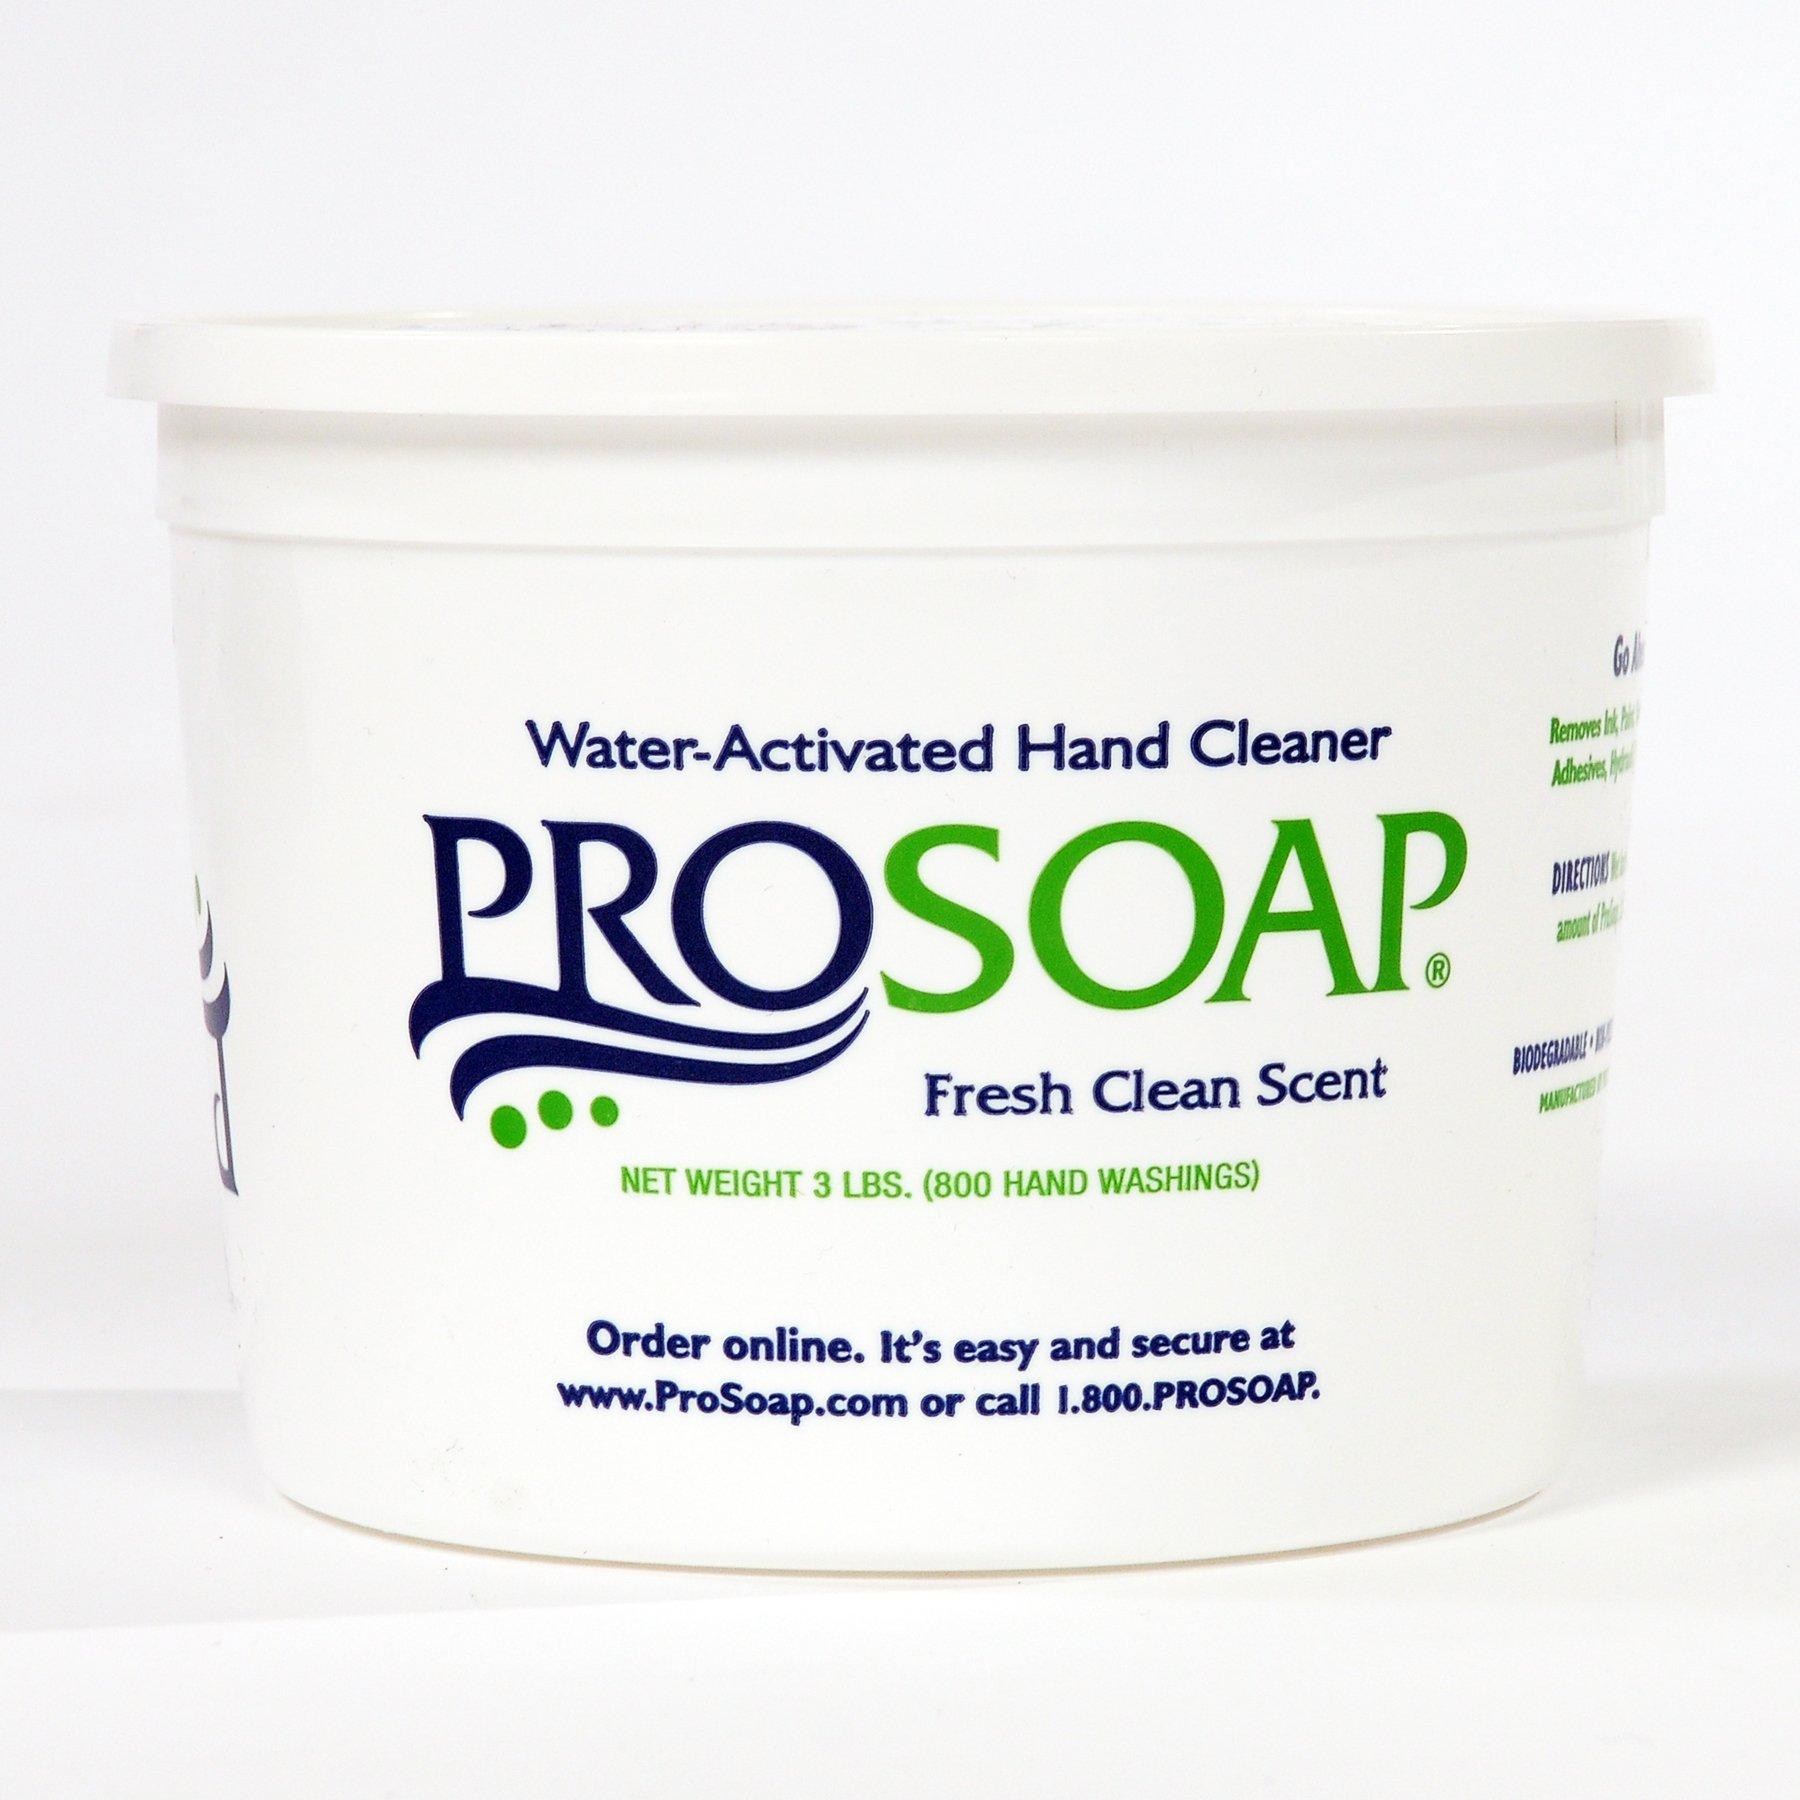 ProSoap 3lb Tub Hand Cleaner by ProSoap (Image #2)